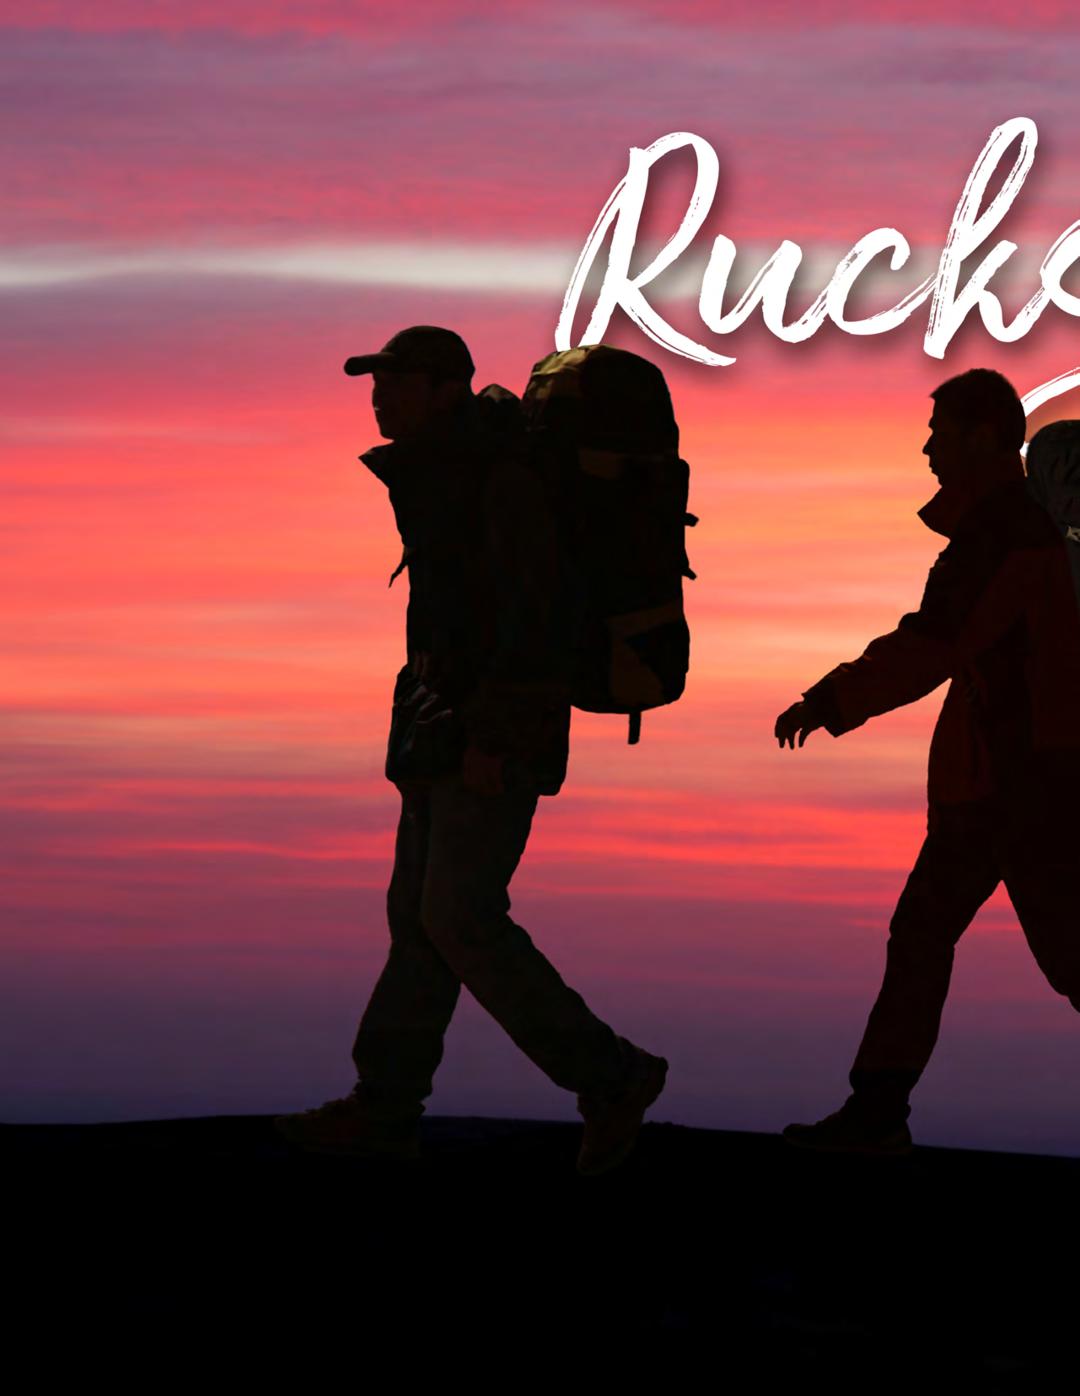 Page 72 of 2021 Caribee Rucksacks